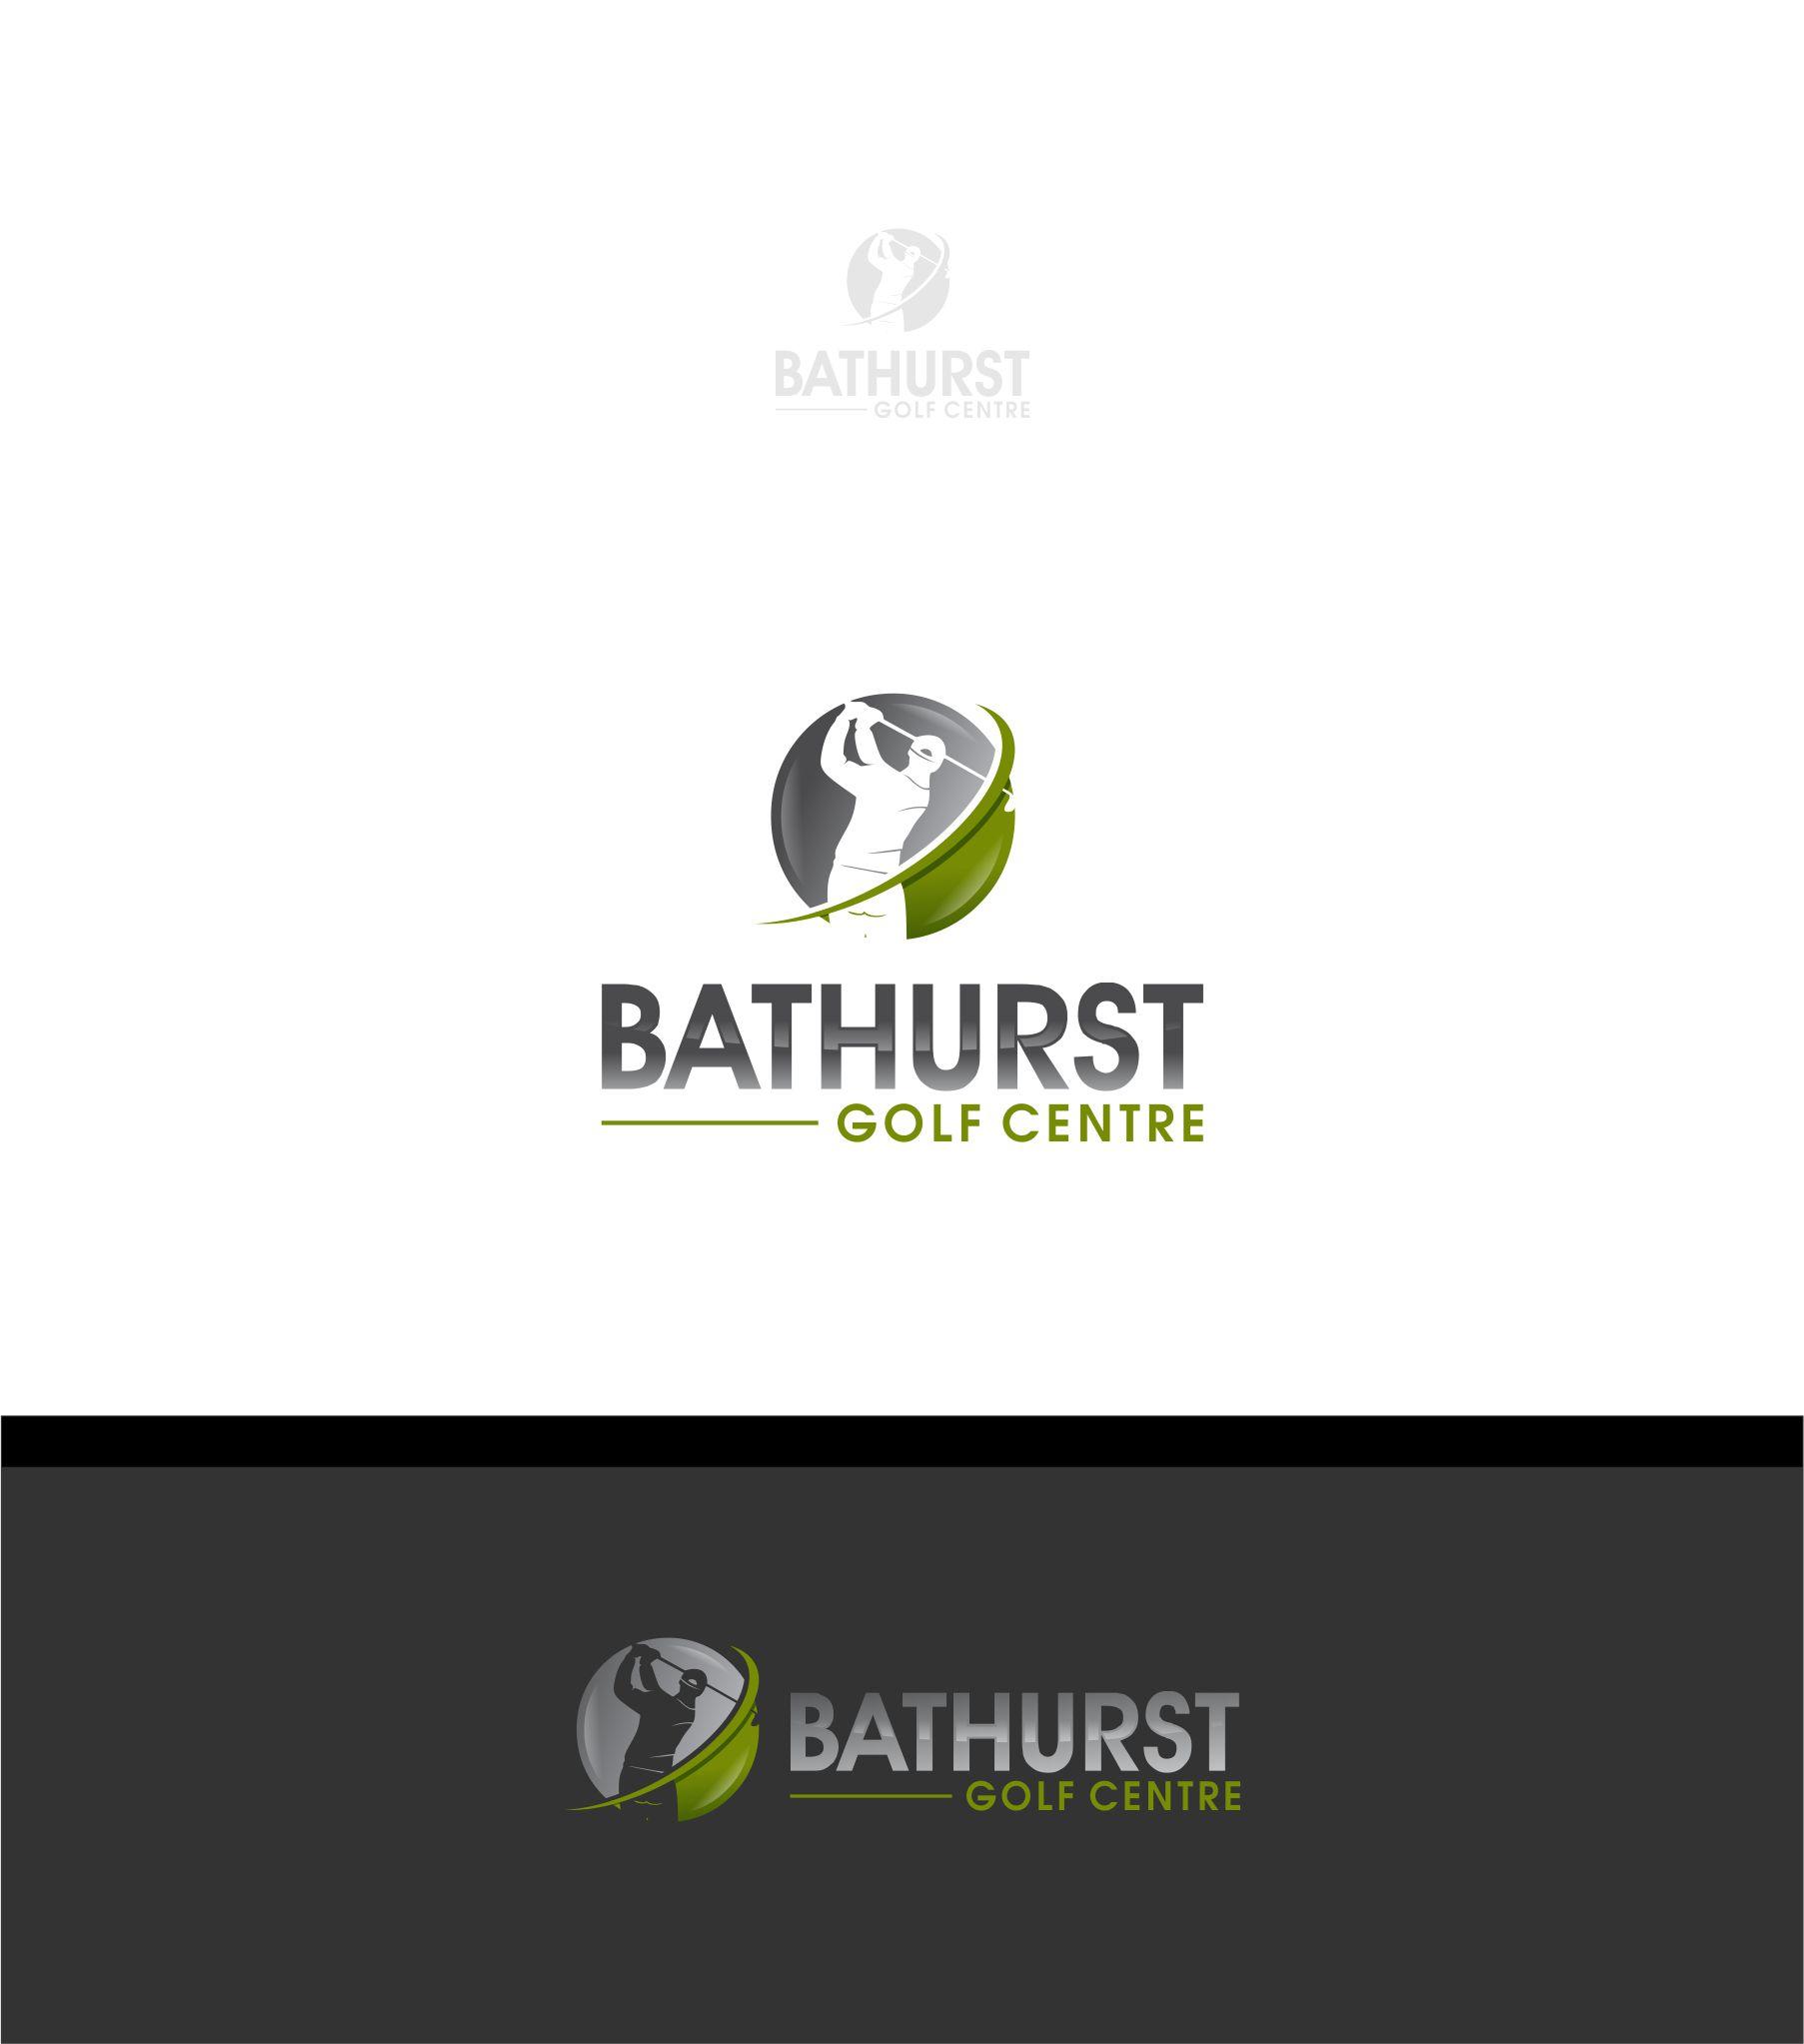 Logo Design by Raymond Garcia - Entry No. 1 in the Logo Design Contest Inspiring Logo Design for Bathurst Golf Centre.